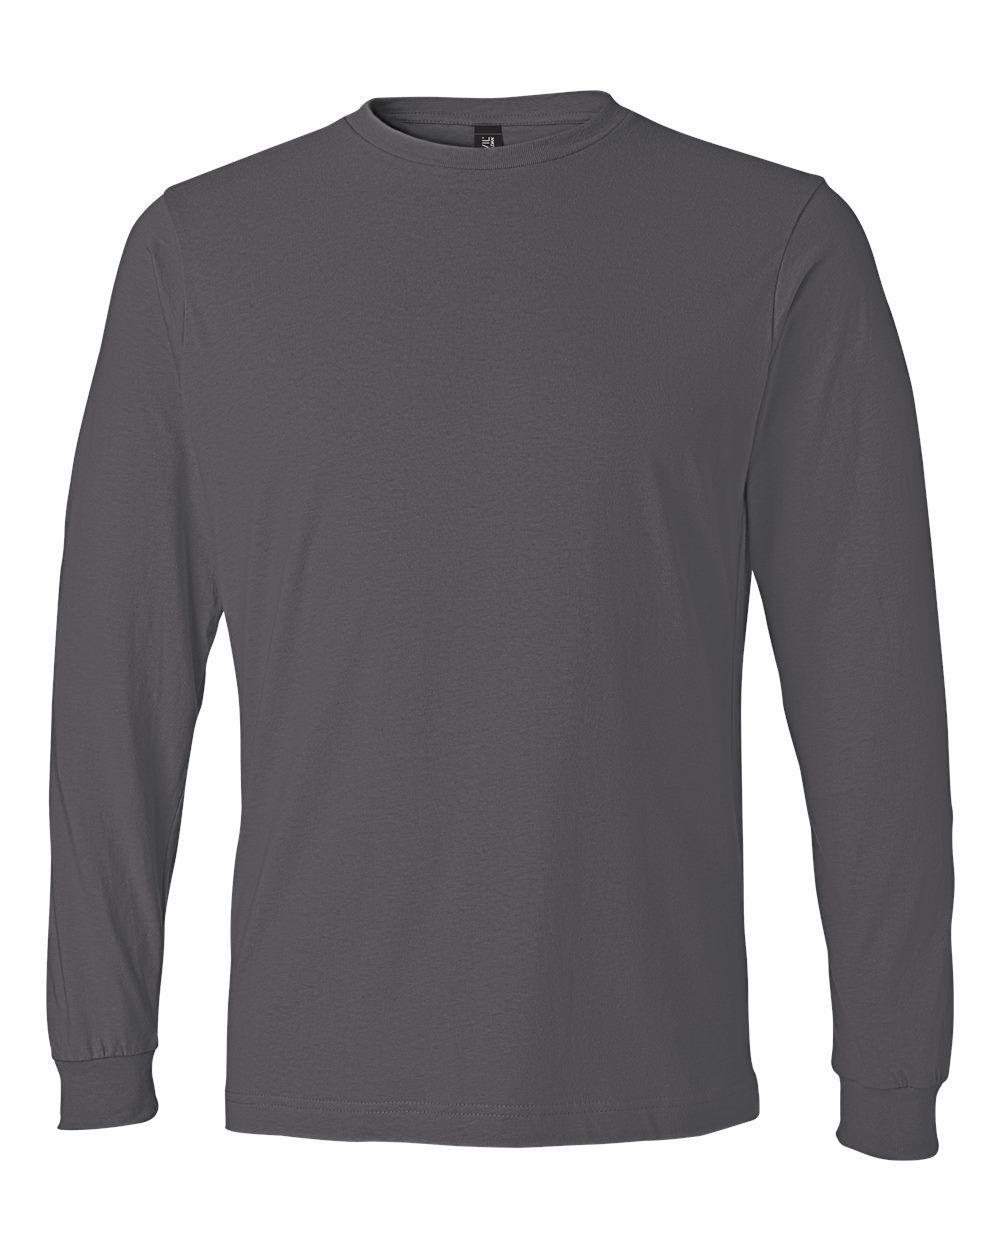 Anvil Tee Shirt